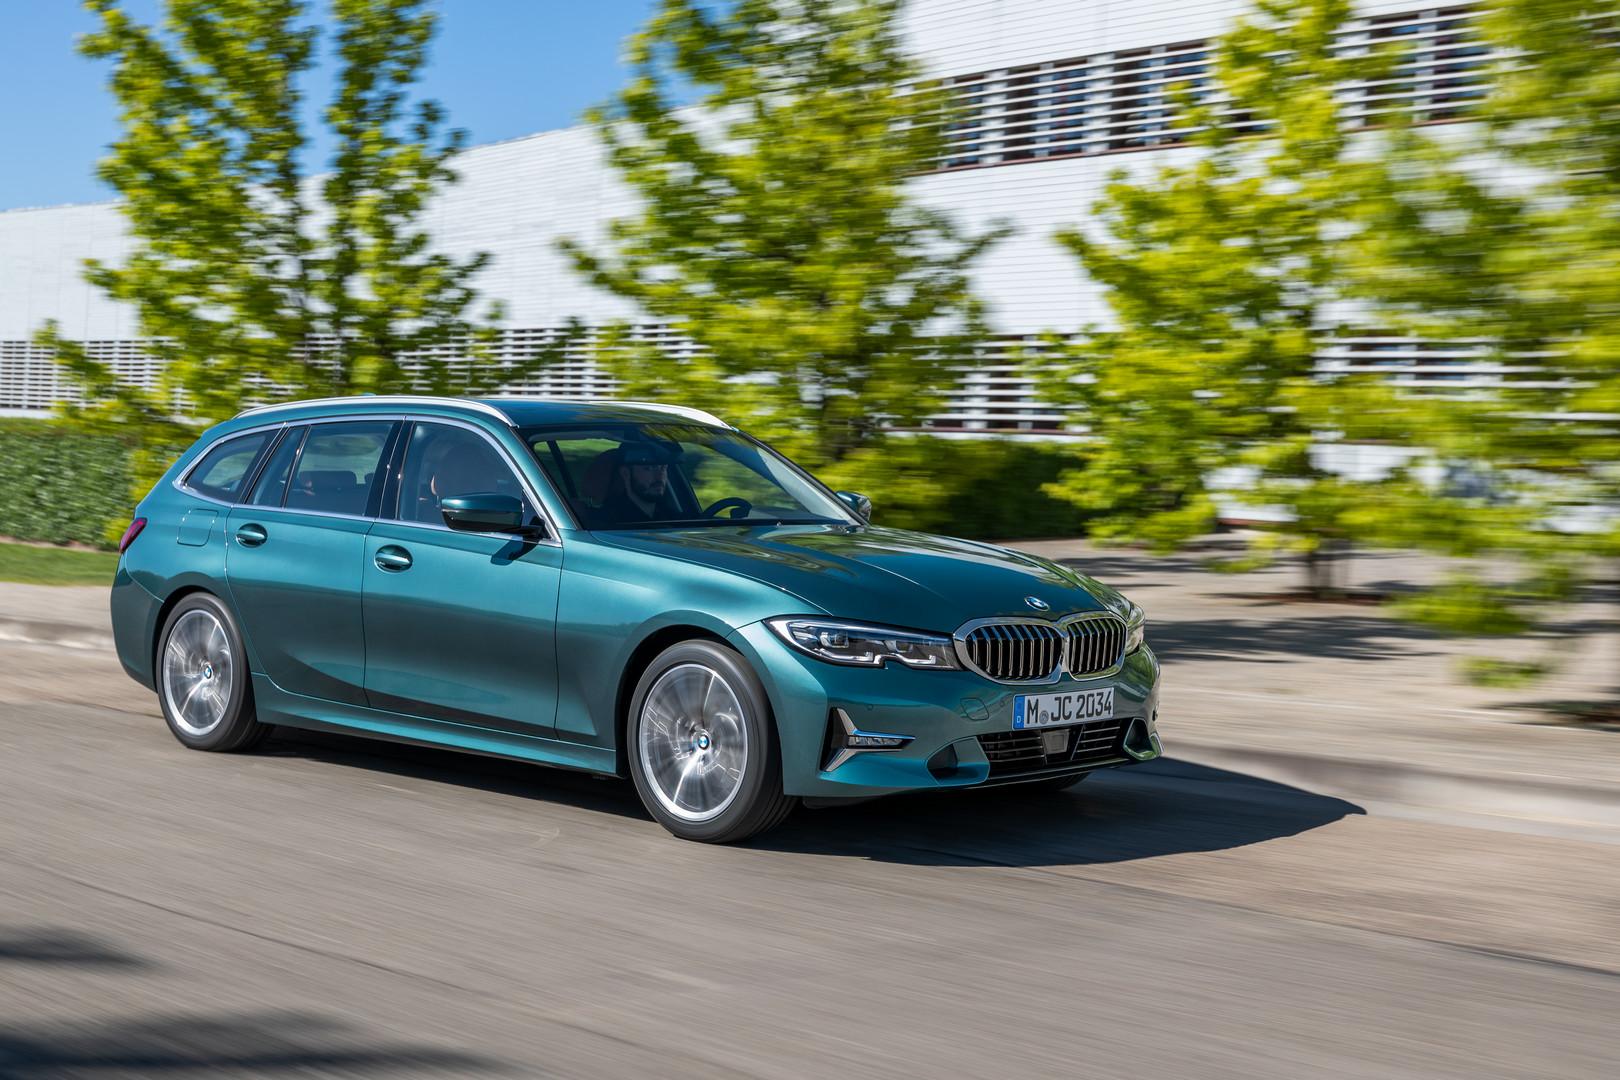 Blue BMW 3-Series Touring